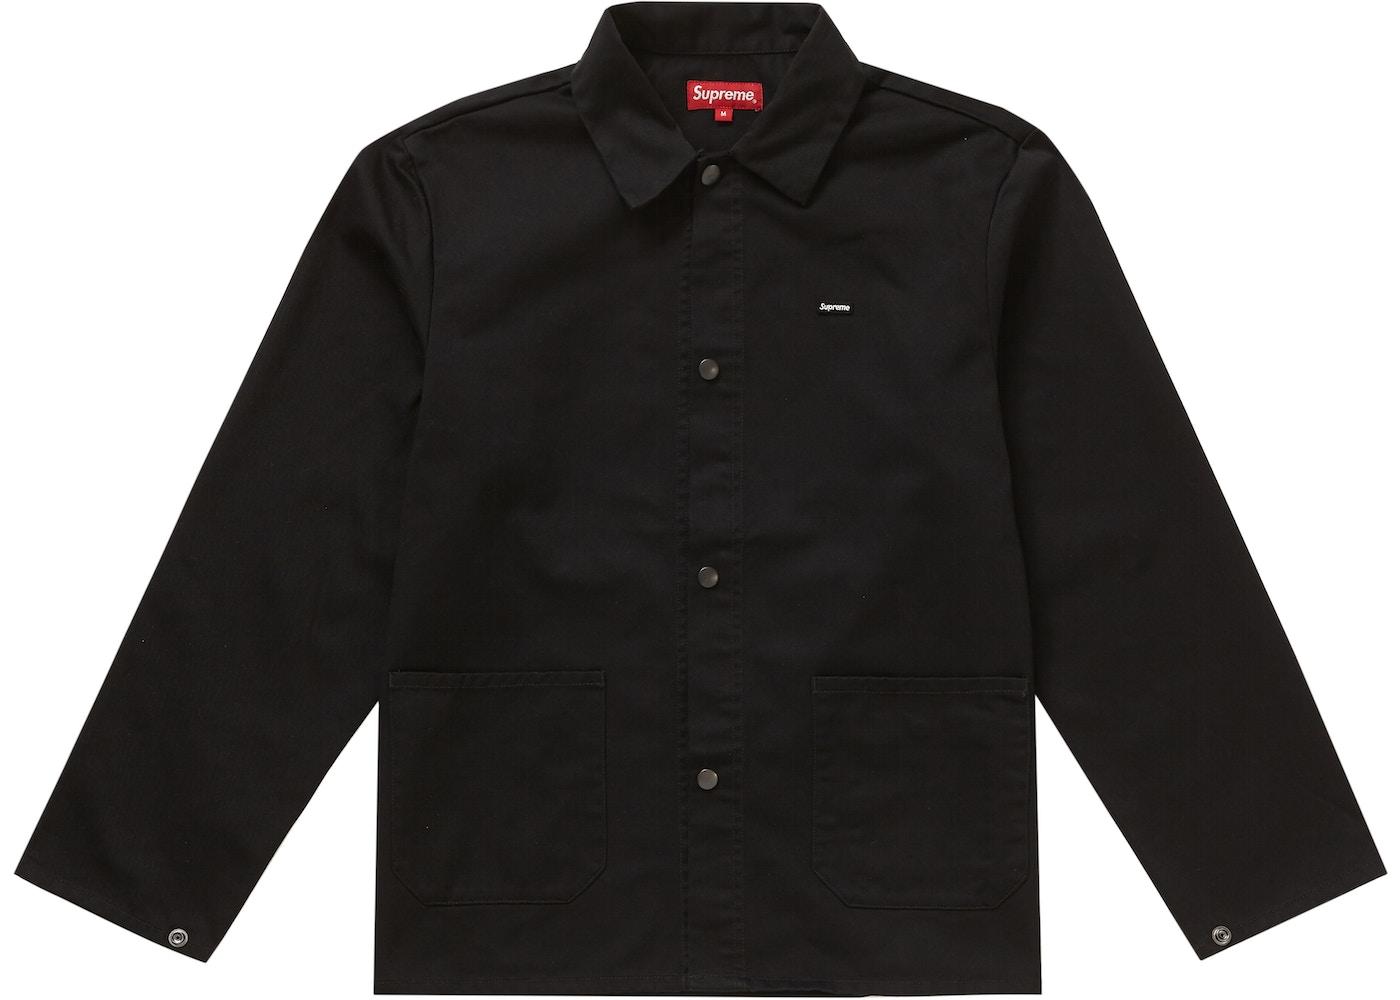 da2f73694 Supreme Jackets - Buy & Sell Streetwear